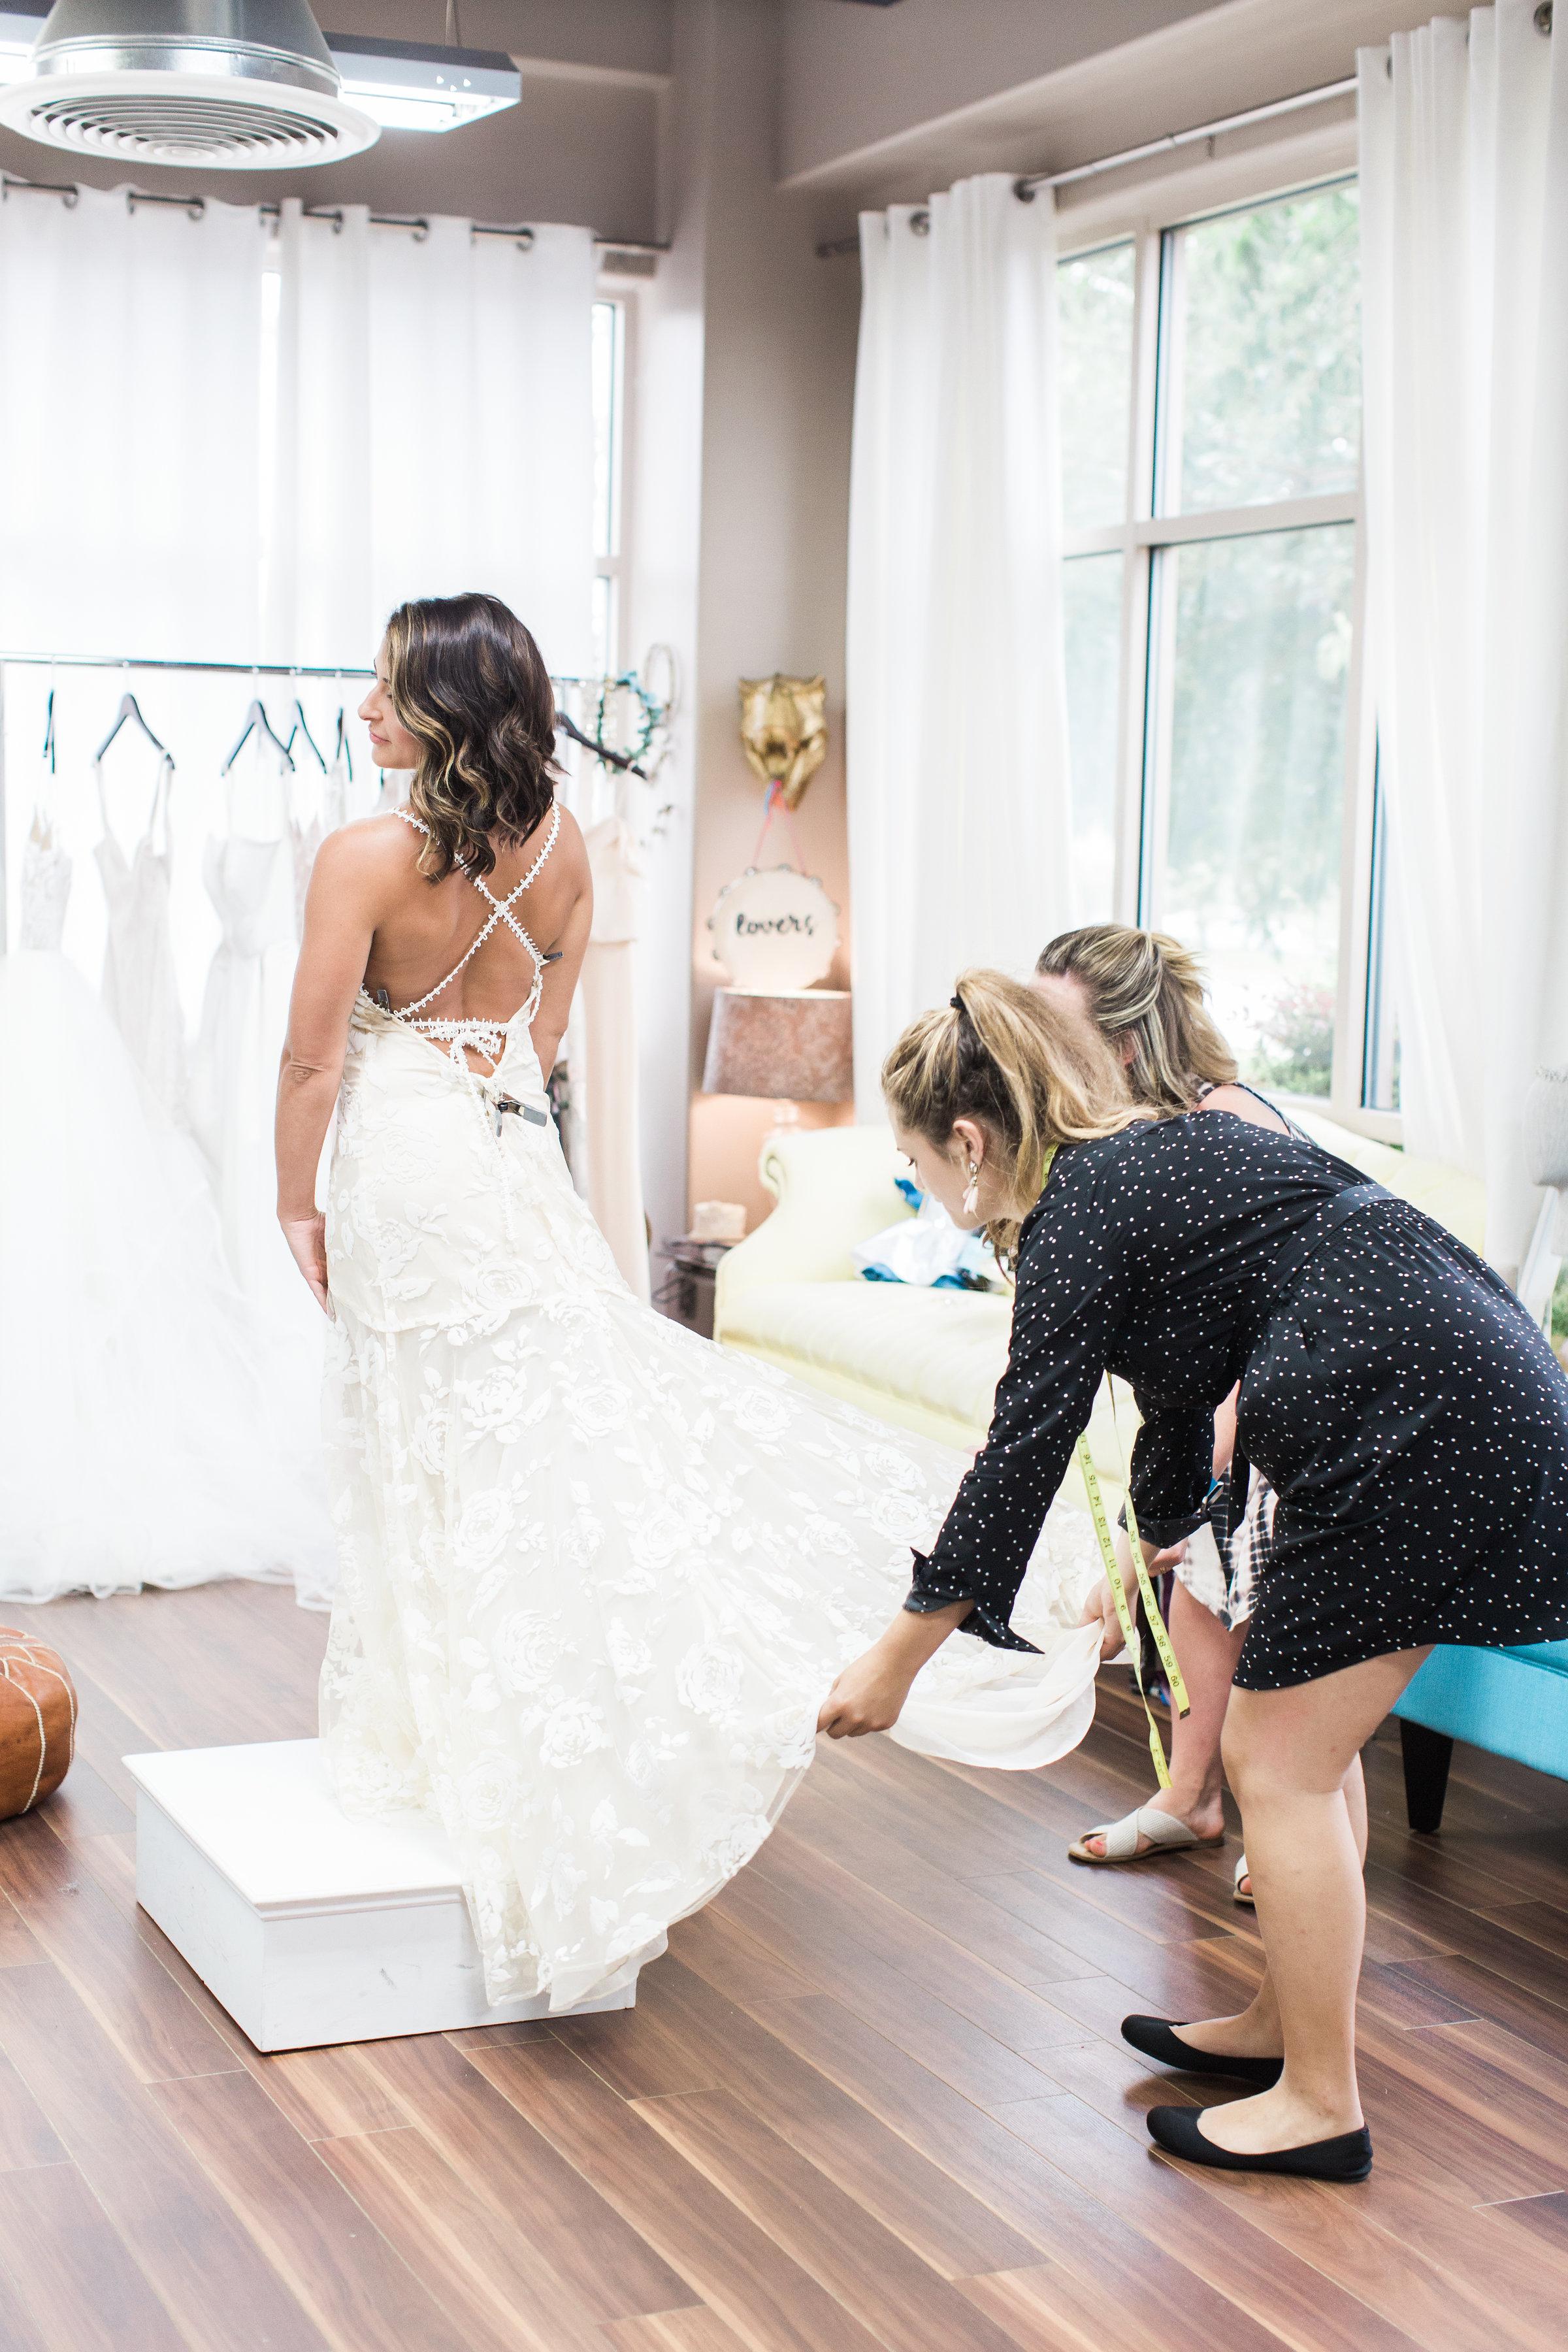 savannah-bridal-boutique-ivory-and-beau-savannah-bride-savannah-bridal-shop-wedding-dress-savannah-weddings-wedding-dress-savannah-aptbphotography-aptbphoto-veils-tiaras-bridal-jewelery-bridesmaids-dresses-bridesmaids-gowns-savannah-bridesmaids.jpg-30.jpg